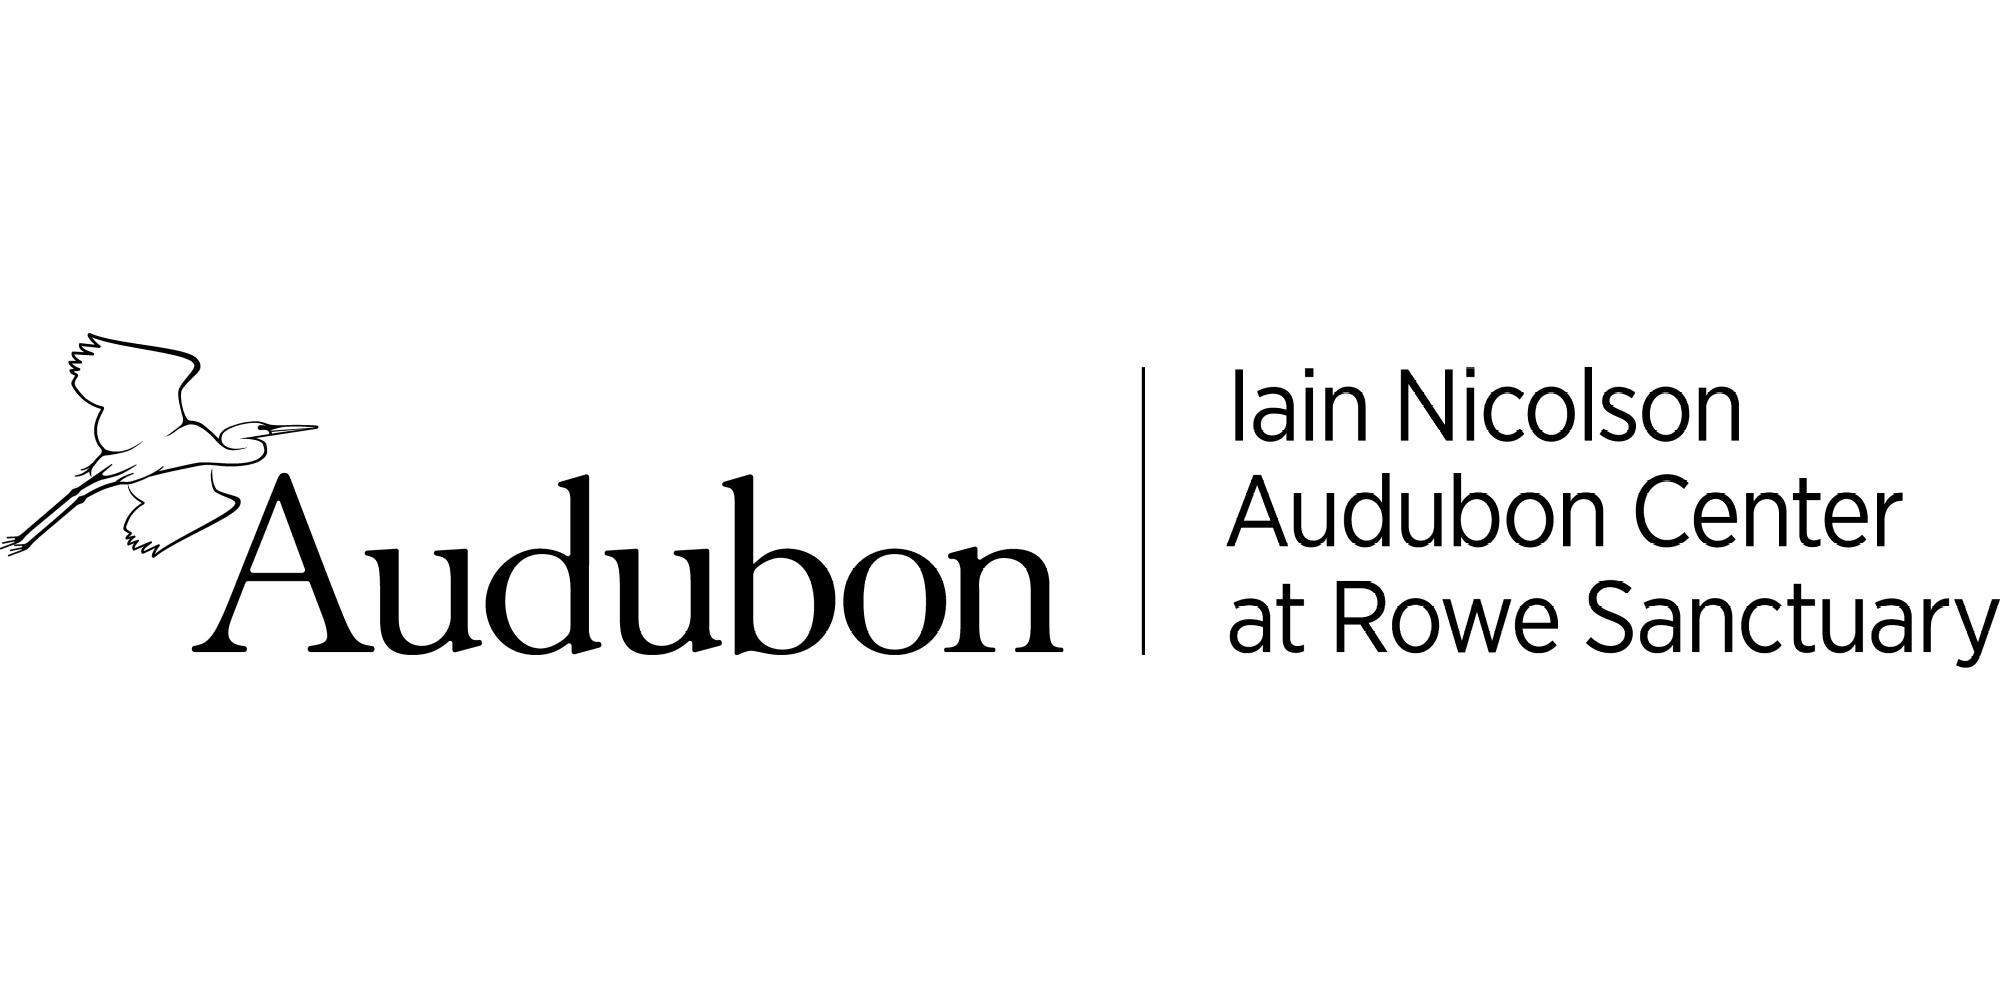 Iain Nicolson Audubon Center at Rowe Sanctuary